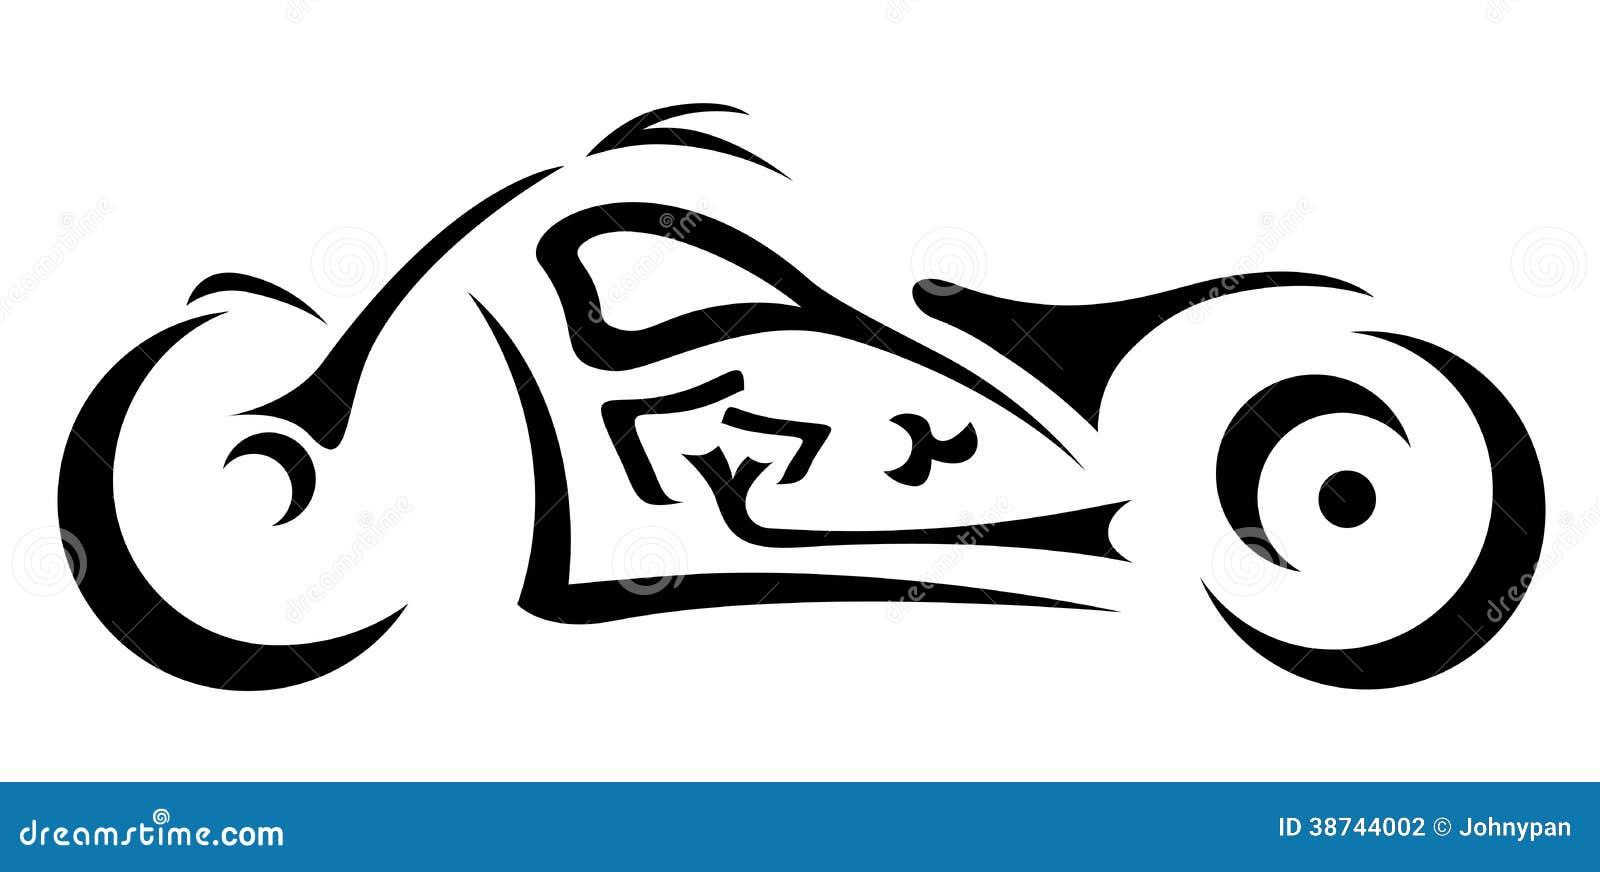 Logos Auto, Moto...: télécharger +80 photos, logos et images Auto, Moto...